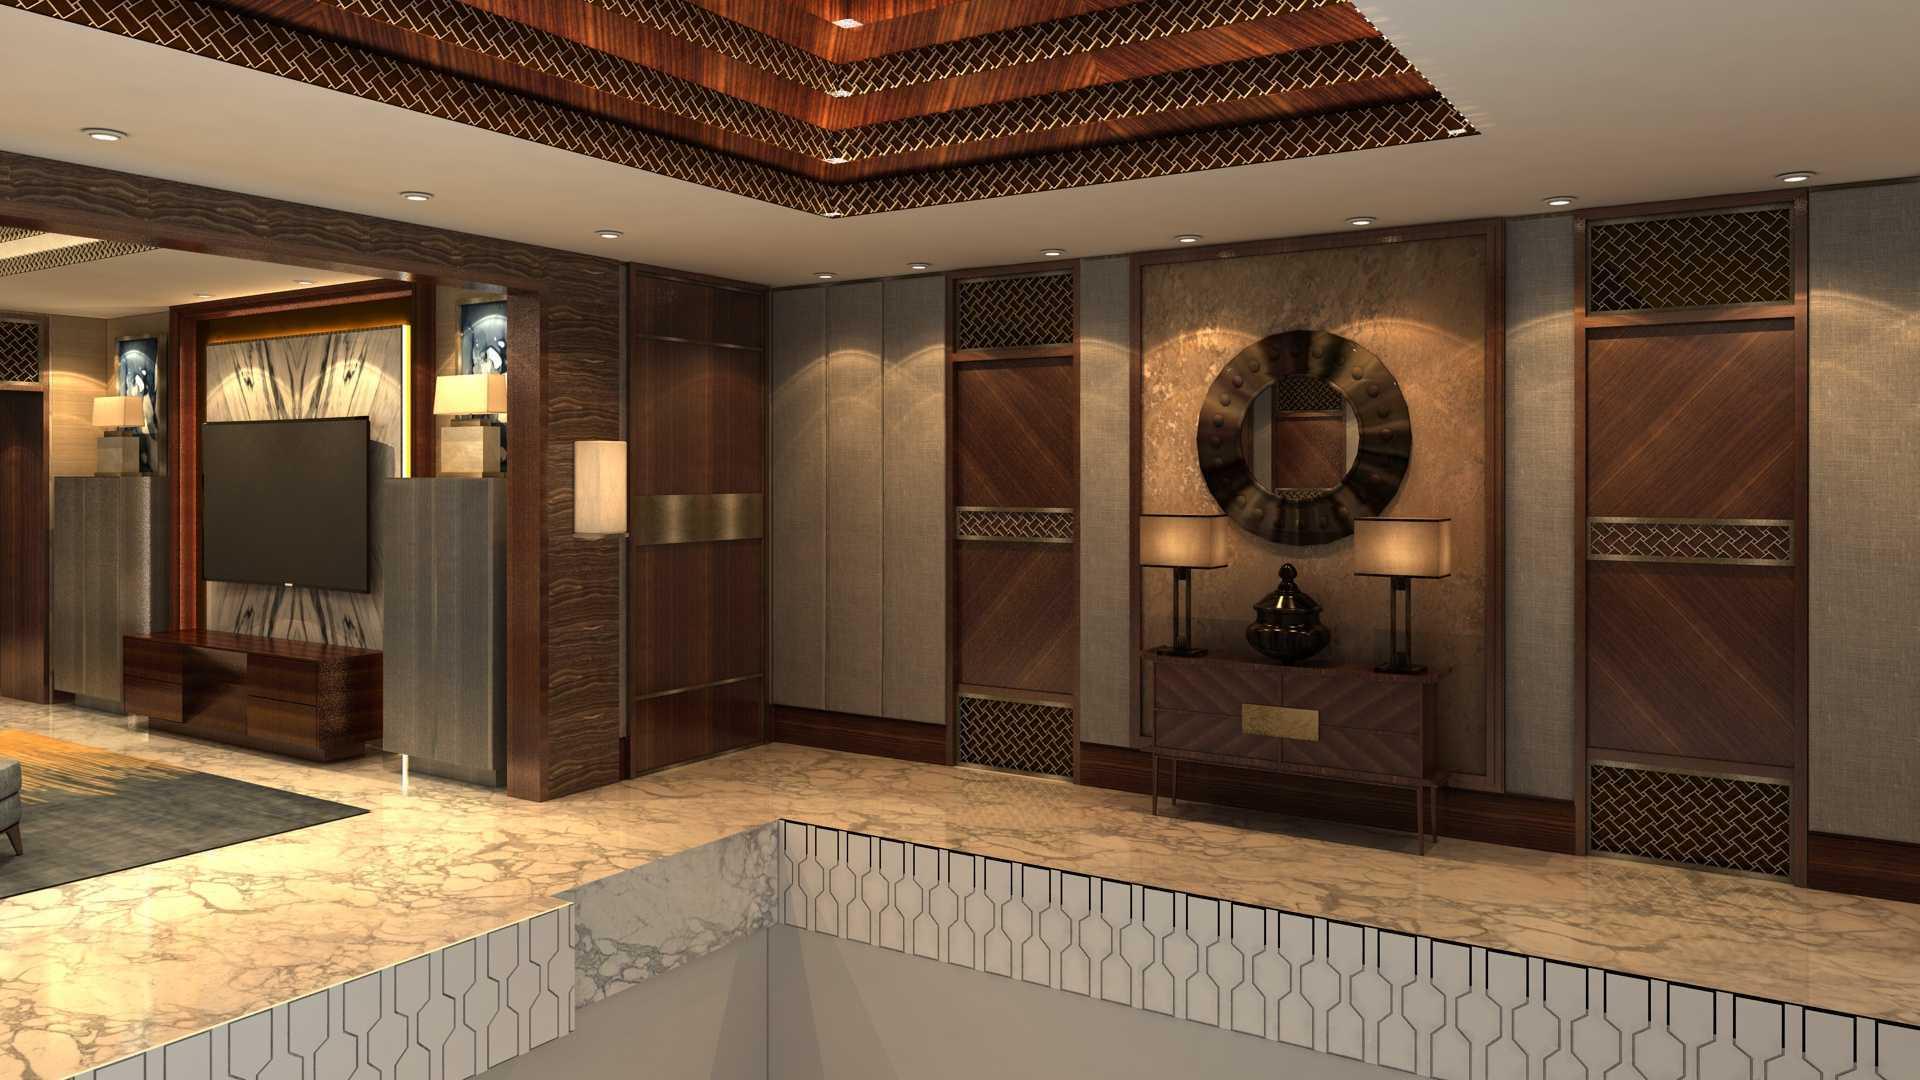 Vin•da•te Mayang Permai Residence Ii - Residential Project (Artist Impression - Construction In Progress) Pantai Indah Kapuk - North Jakarta Pantai Indah Kapuk - North Jakarta Lt Kontemporer  17220